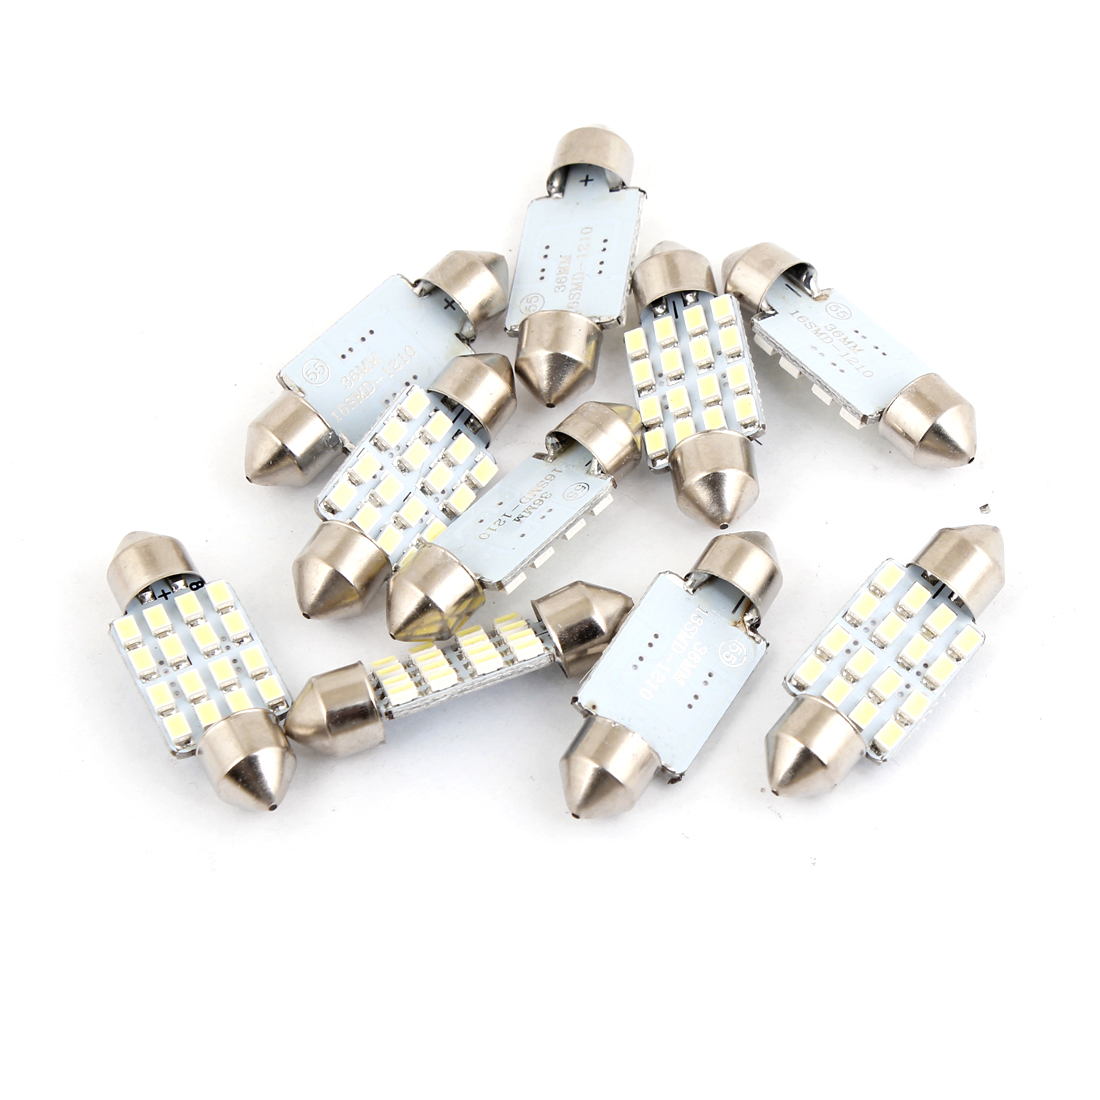 10 Pcs Car Interior White 1210 16 SMD LED Festoon Dome Light Bulb 36mm